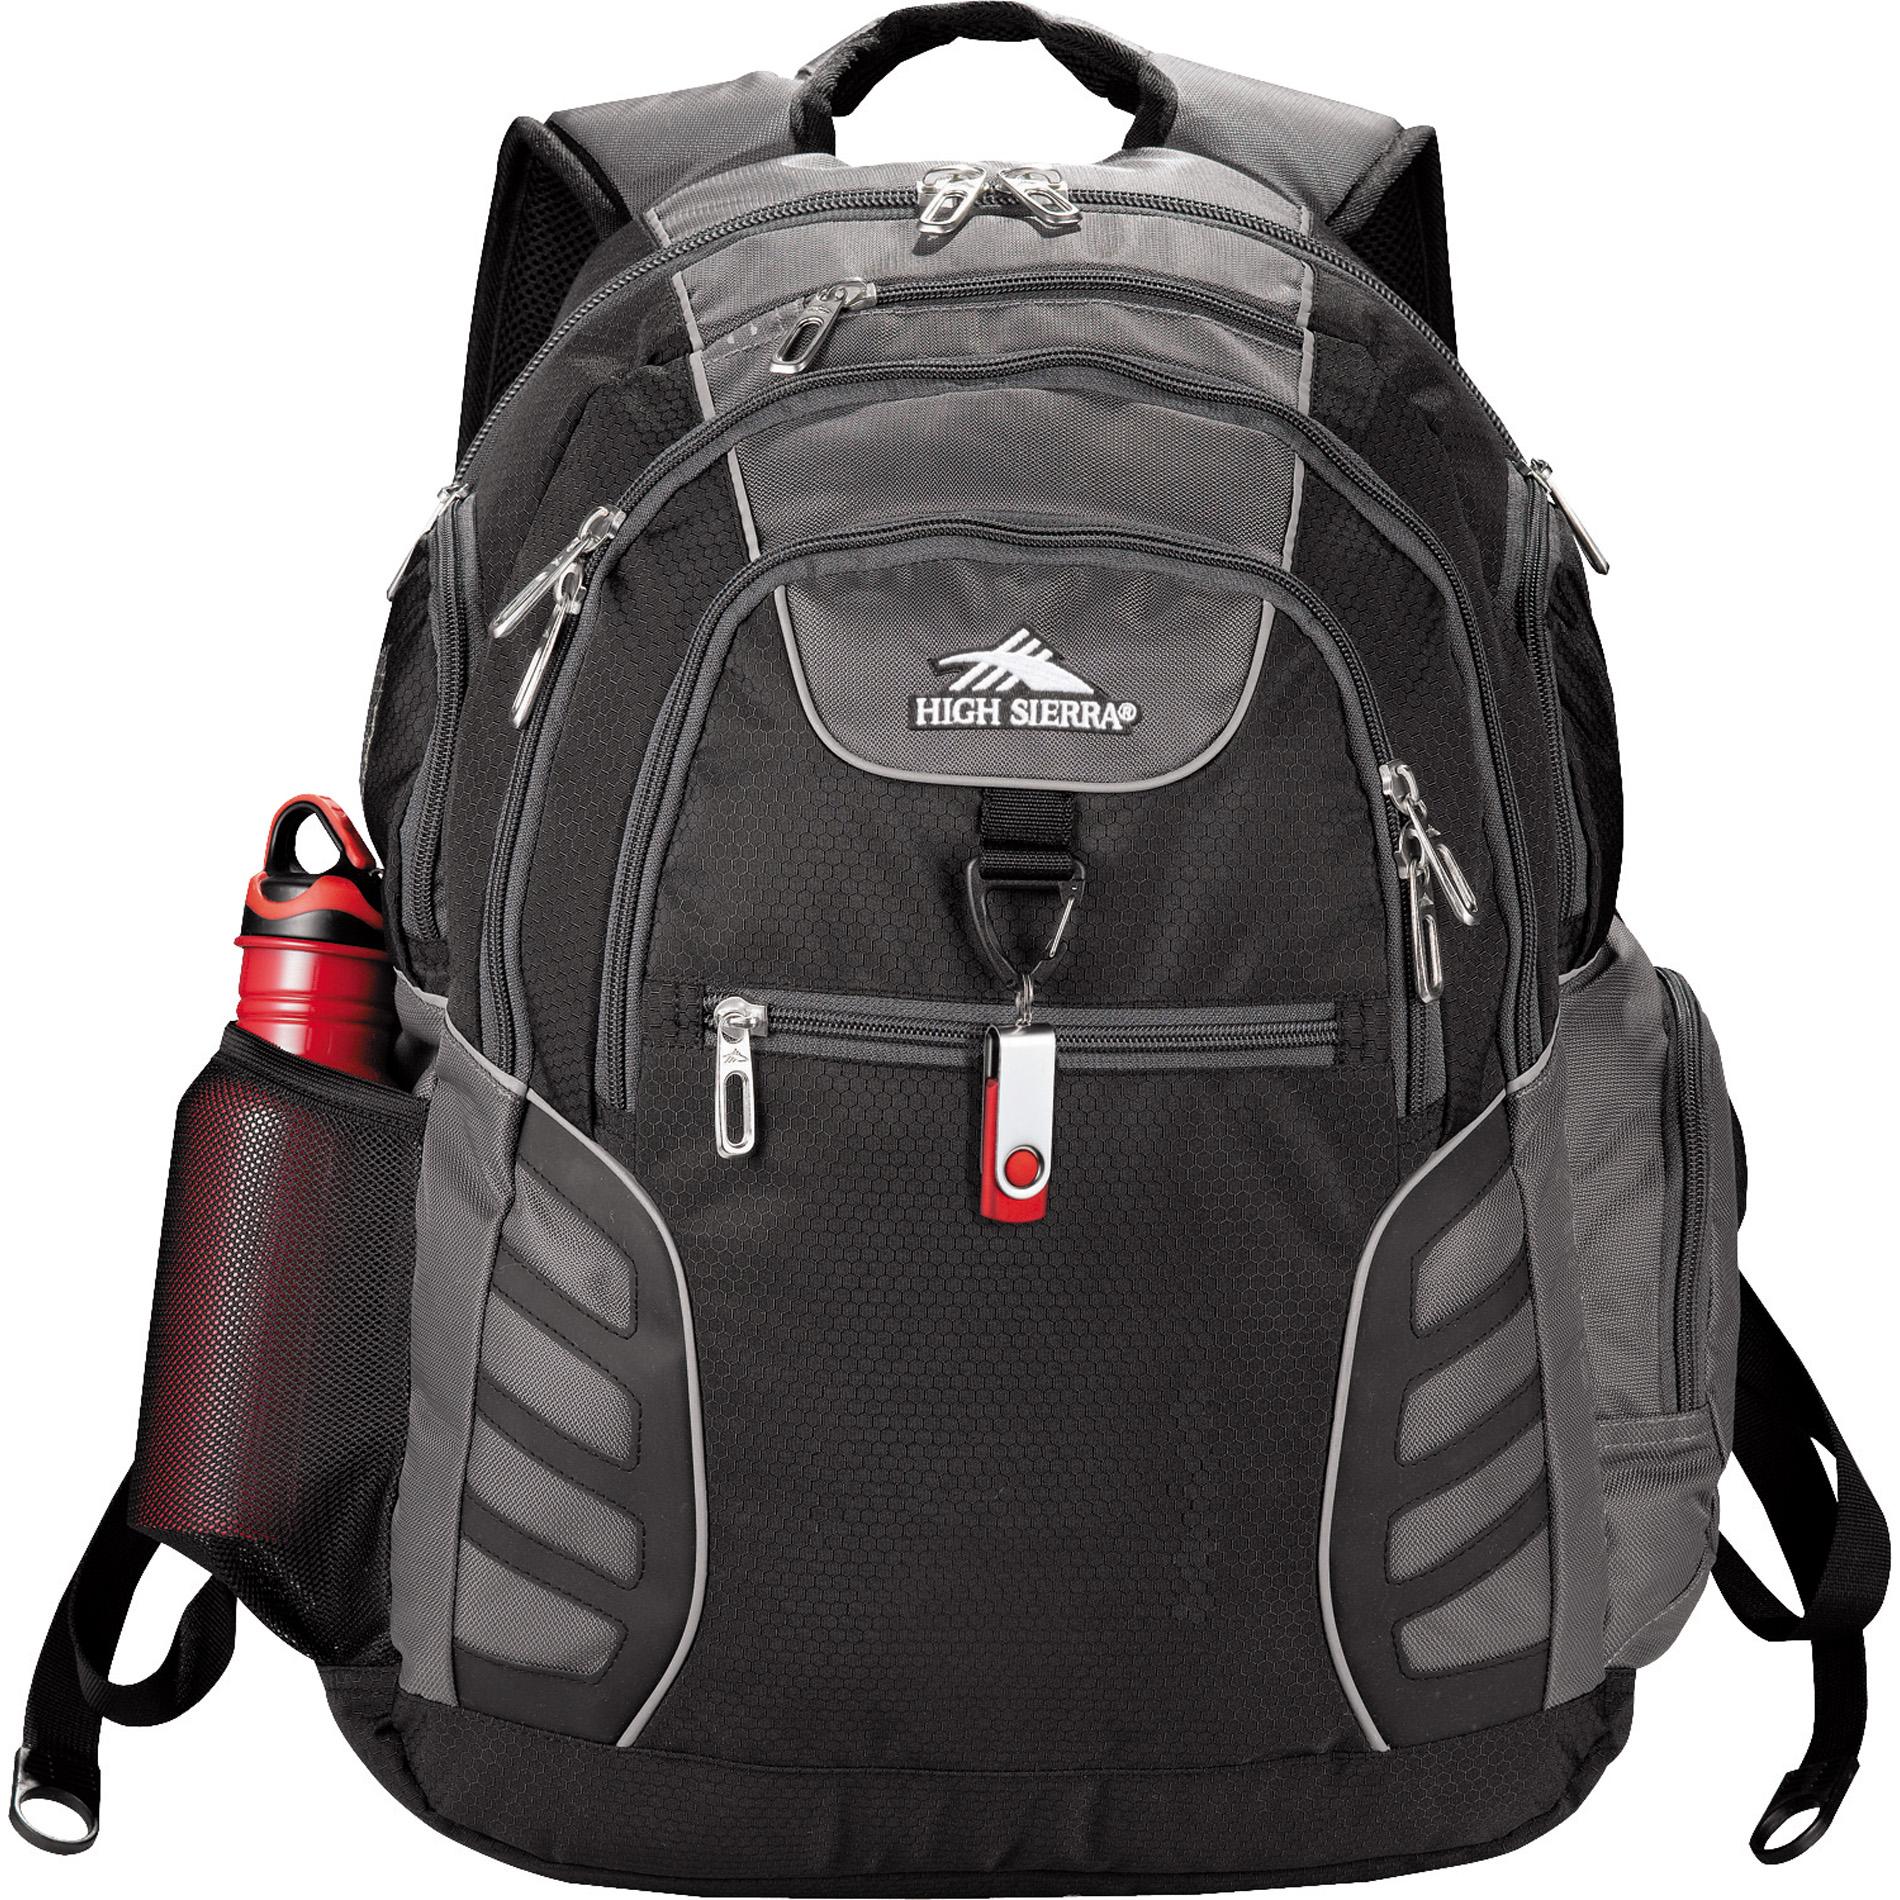 High Sierra 8051-15 - Big Wig 17 Computer Backpack